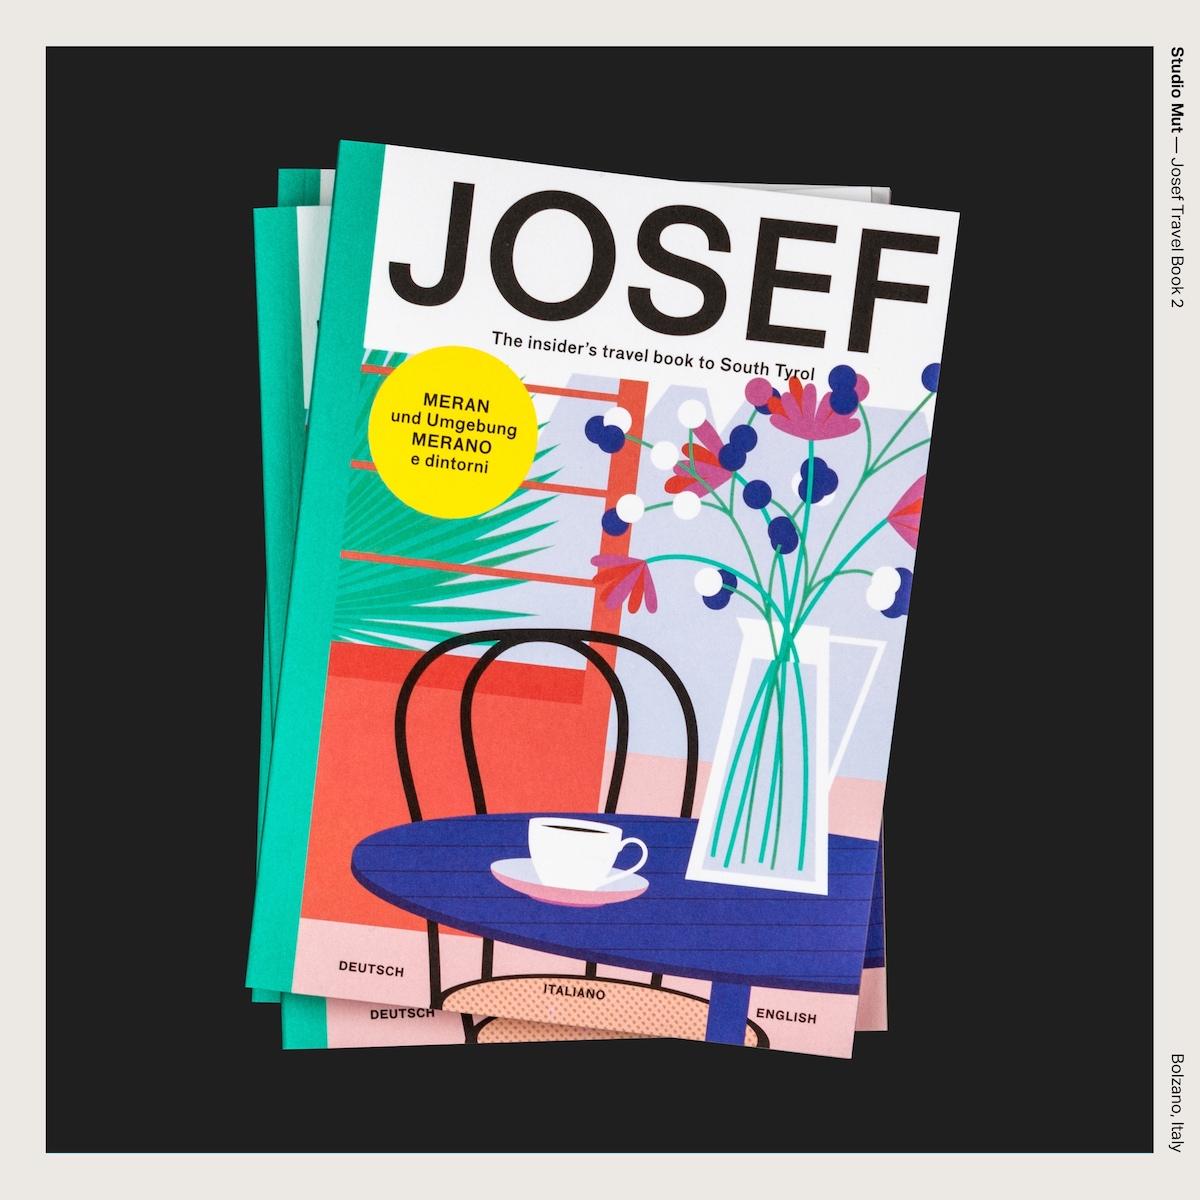 Studio Mut — Josef Travel Book 2